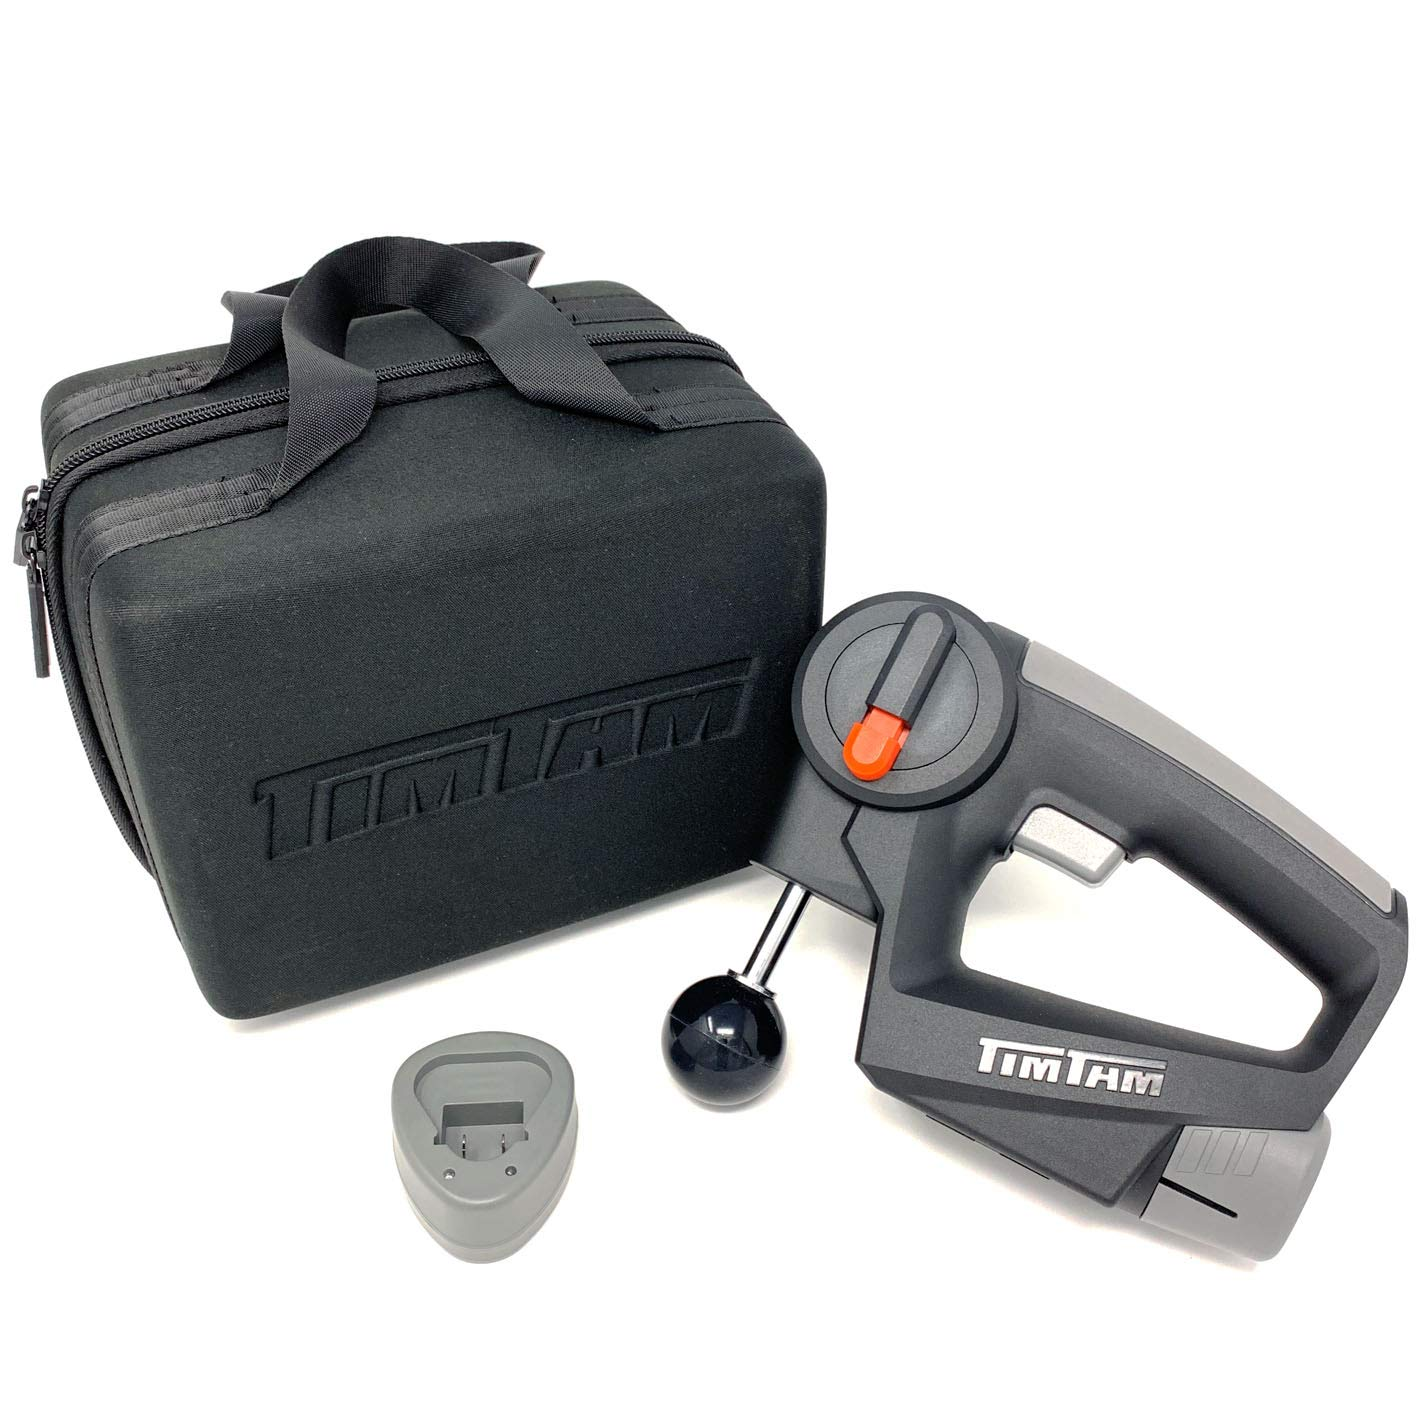 TimTam Power Massager - Handheld Deep Tissue Massage Gun for Athletes (Gray)